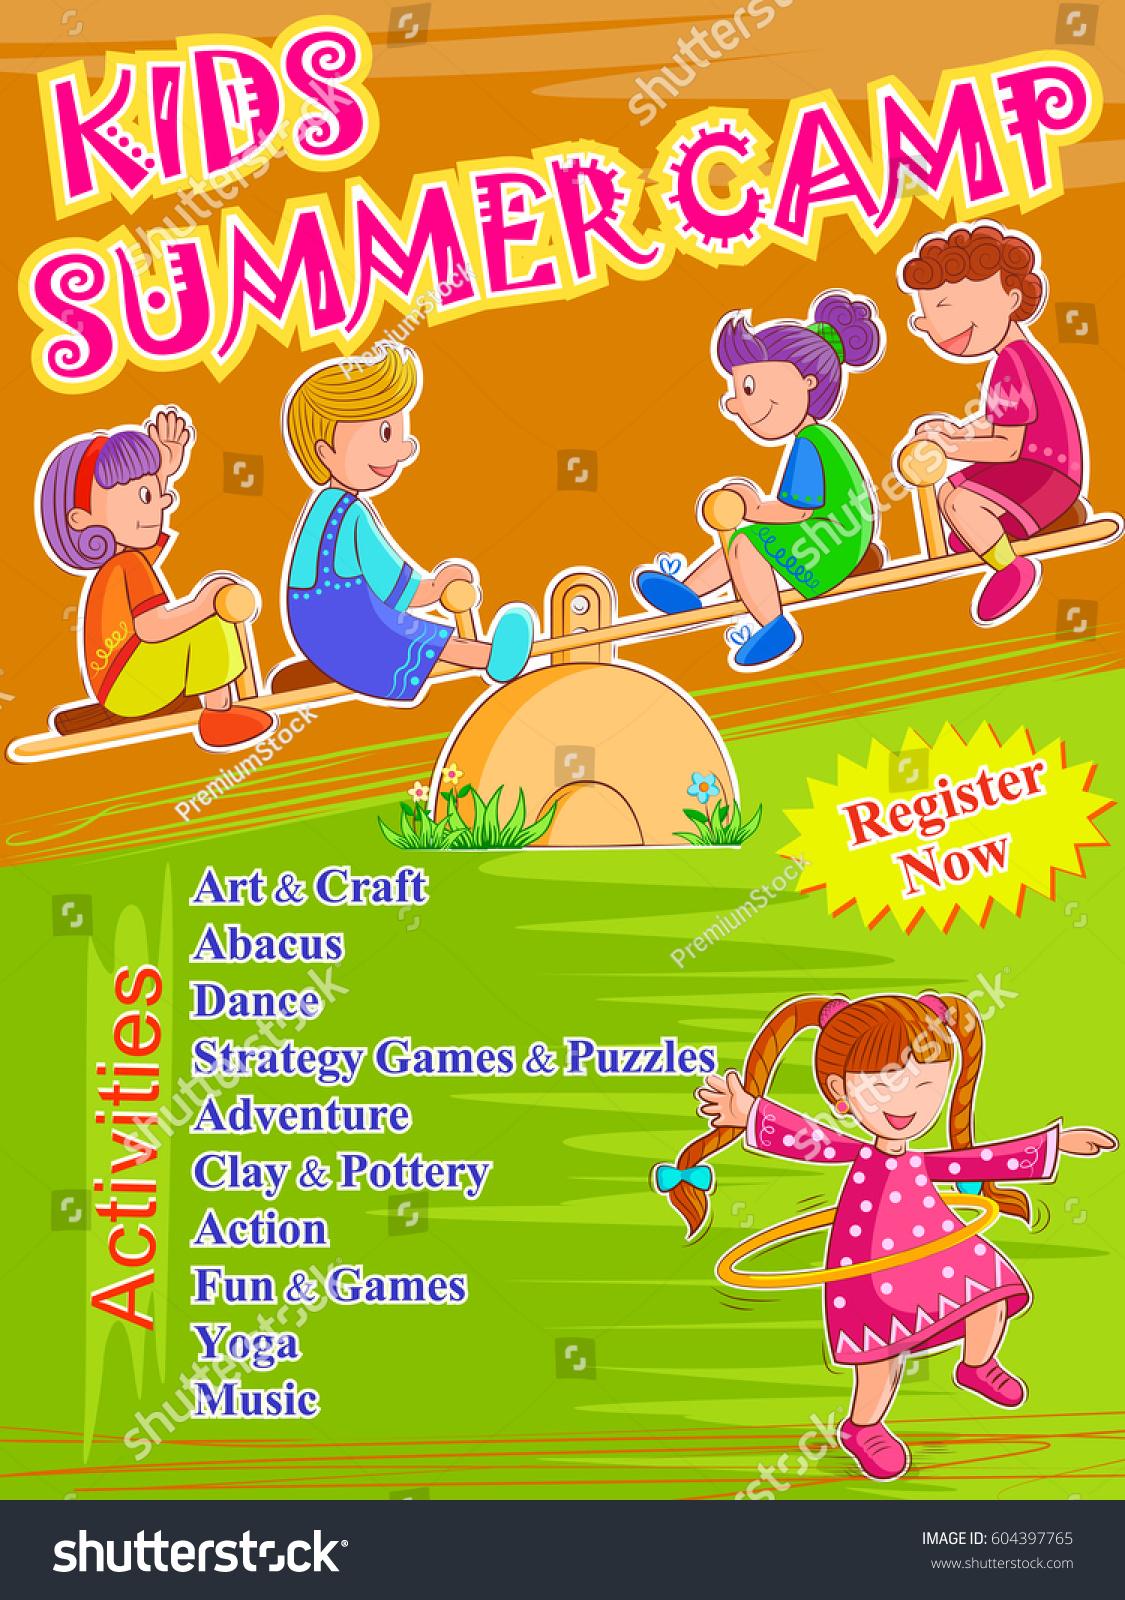 Poster design template - Vector Design Of Banner Poster Design Template For Kids Summer Camp Activities